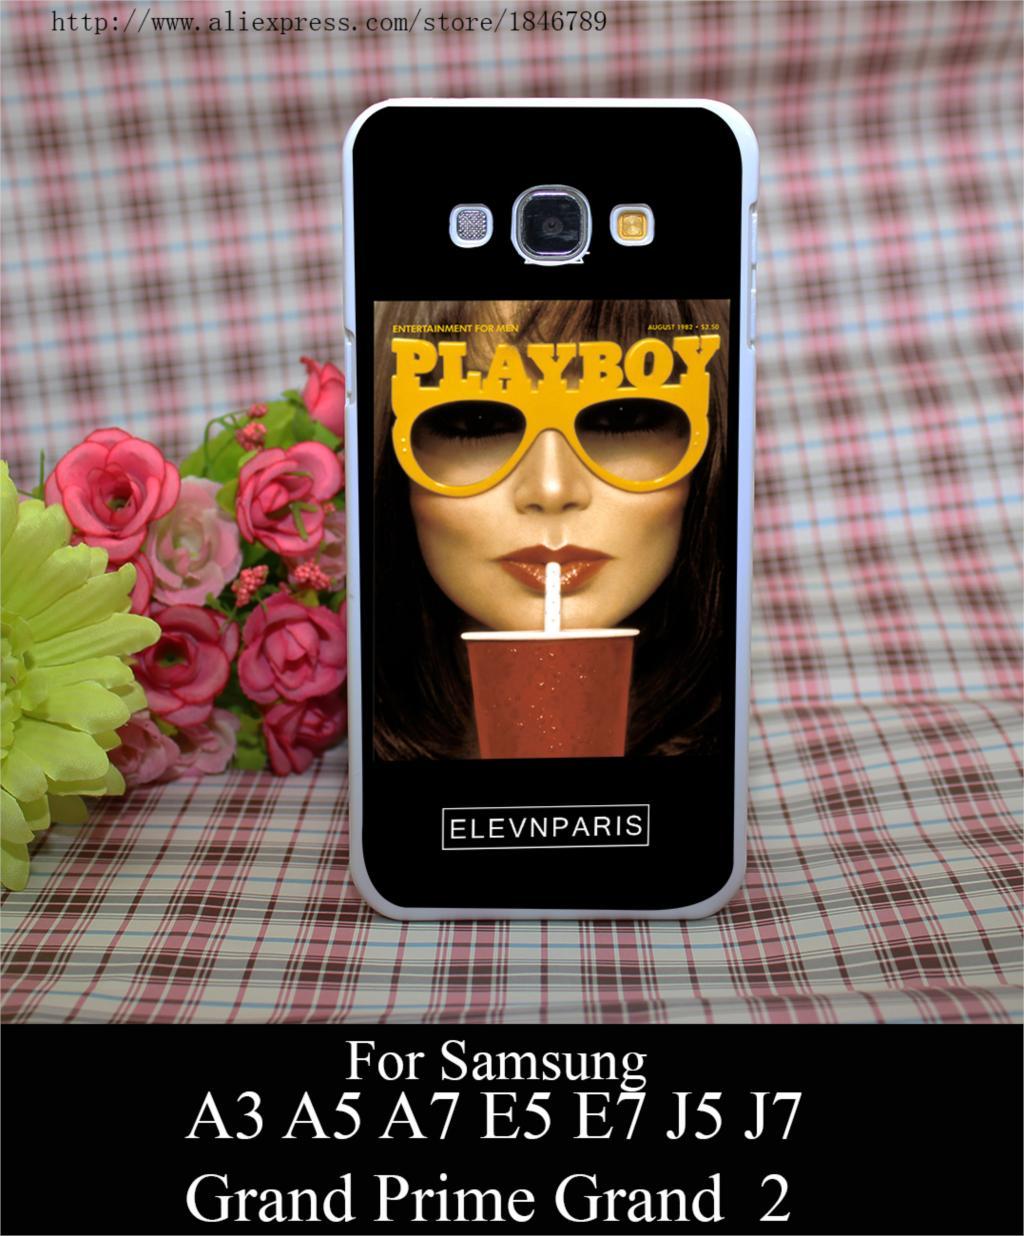 Eleven P Coque P Boy Drink Style White Hard Case Cover for Samsung A3 A5 A7 A8 E5 E7 J5 J7 Grand Prime 2 G530(China (Mainland))